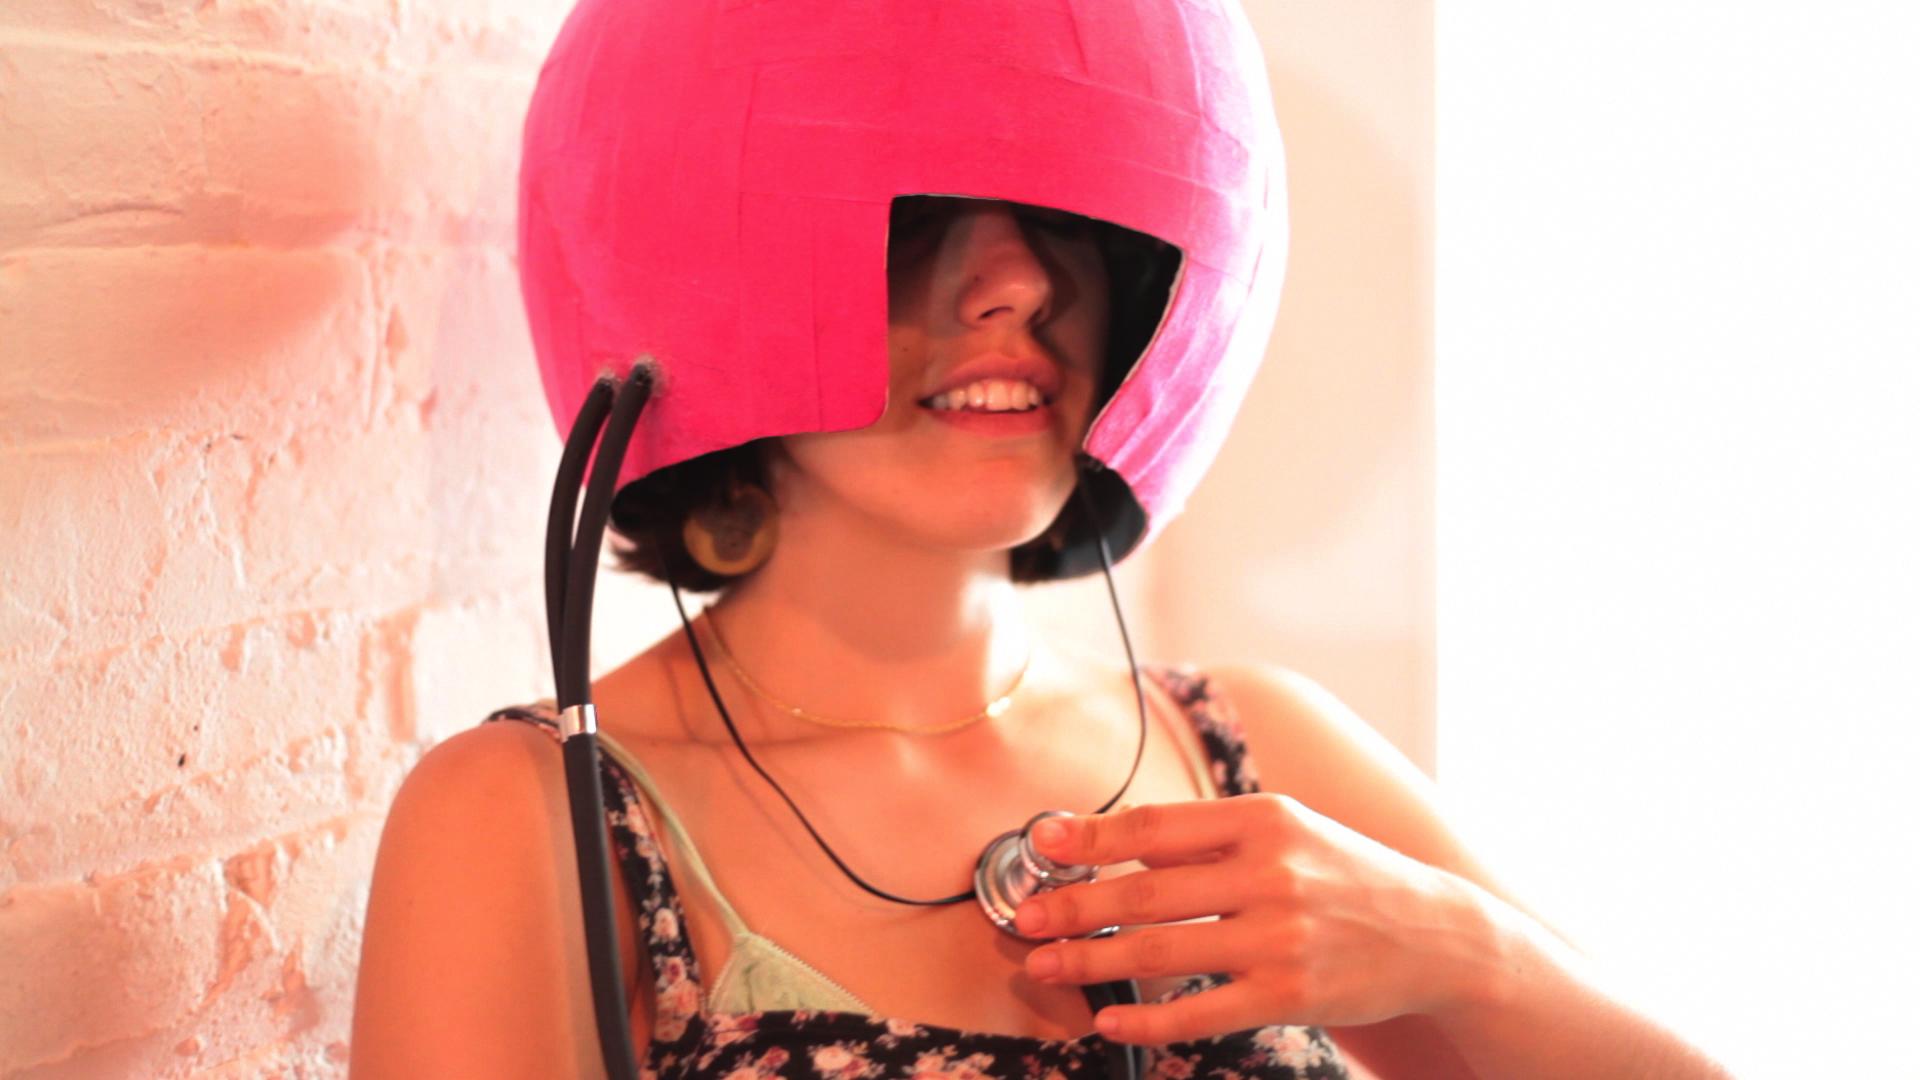 Foley_Rabinovich_Heart_Hat_Pink Noise_Salon.jpg